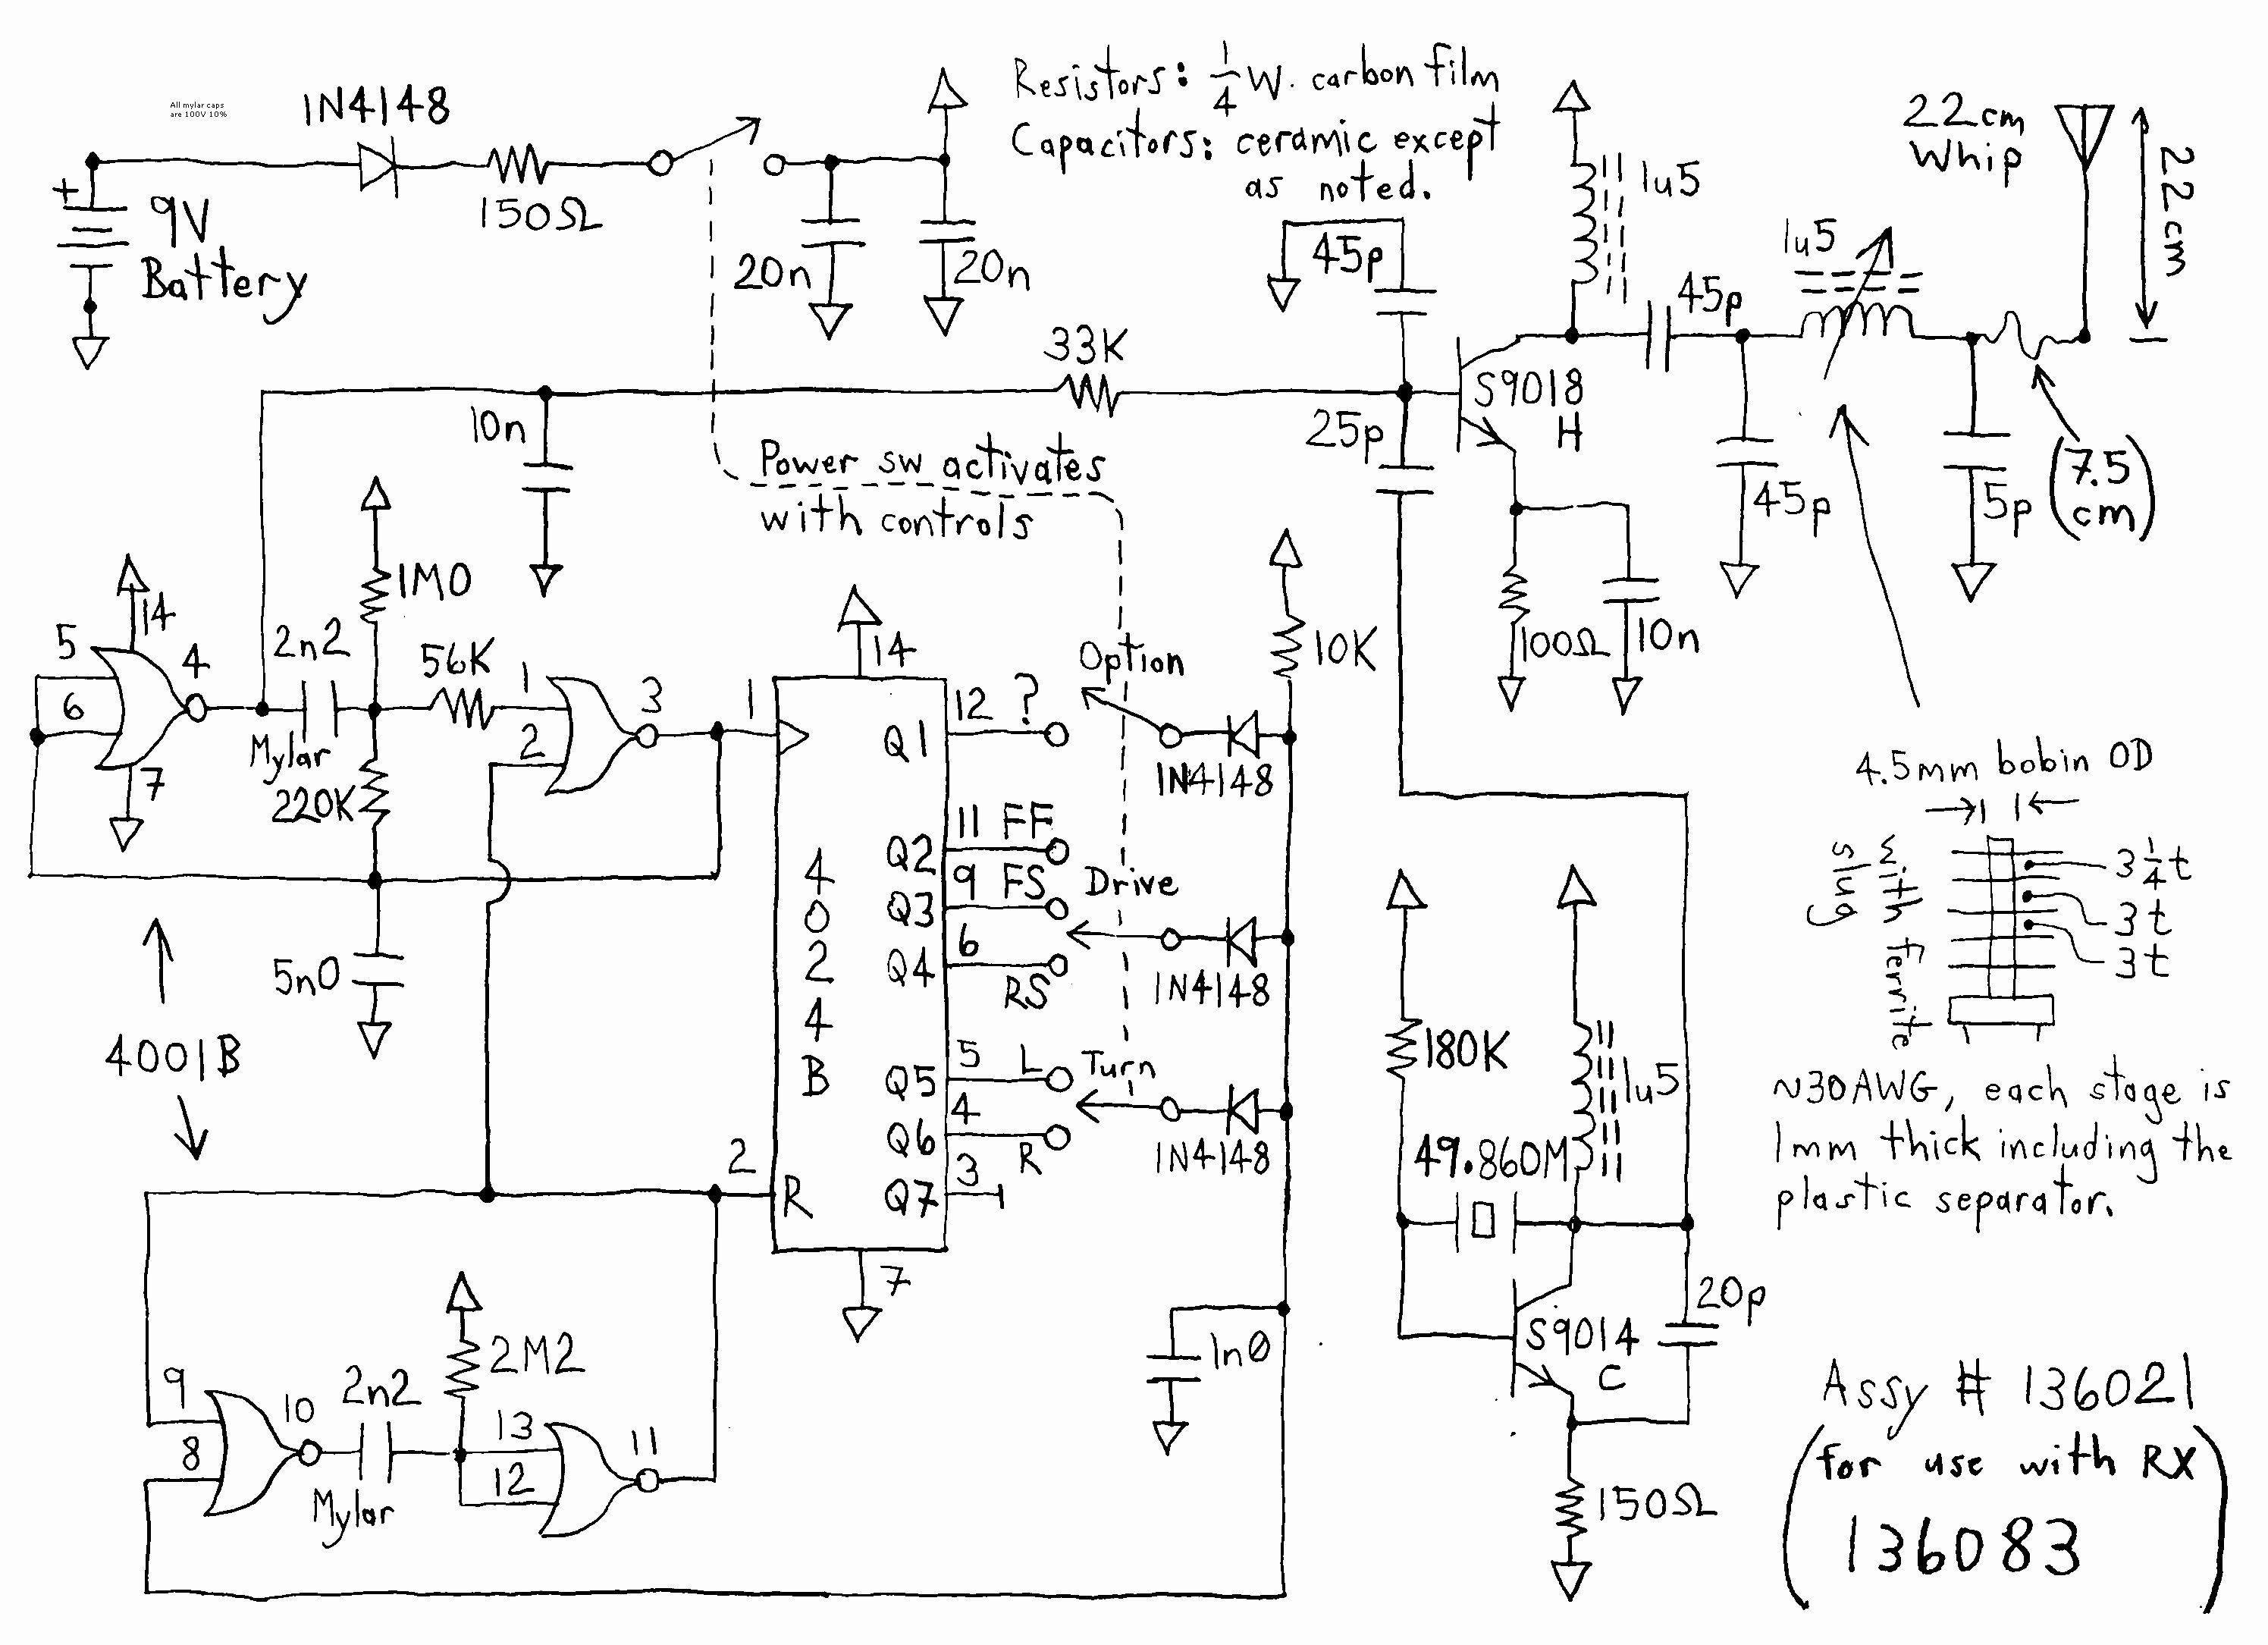 Bad Boy Wiring Diagram - Wiring Diagram Blog - Bad Boy Wiring Diagram